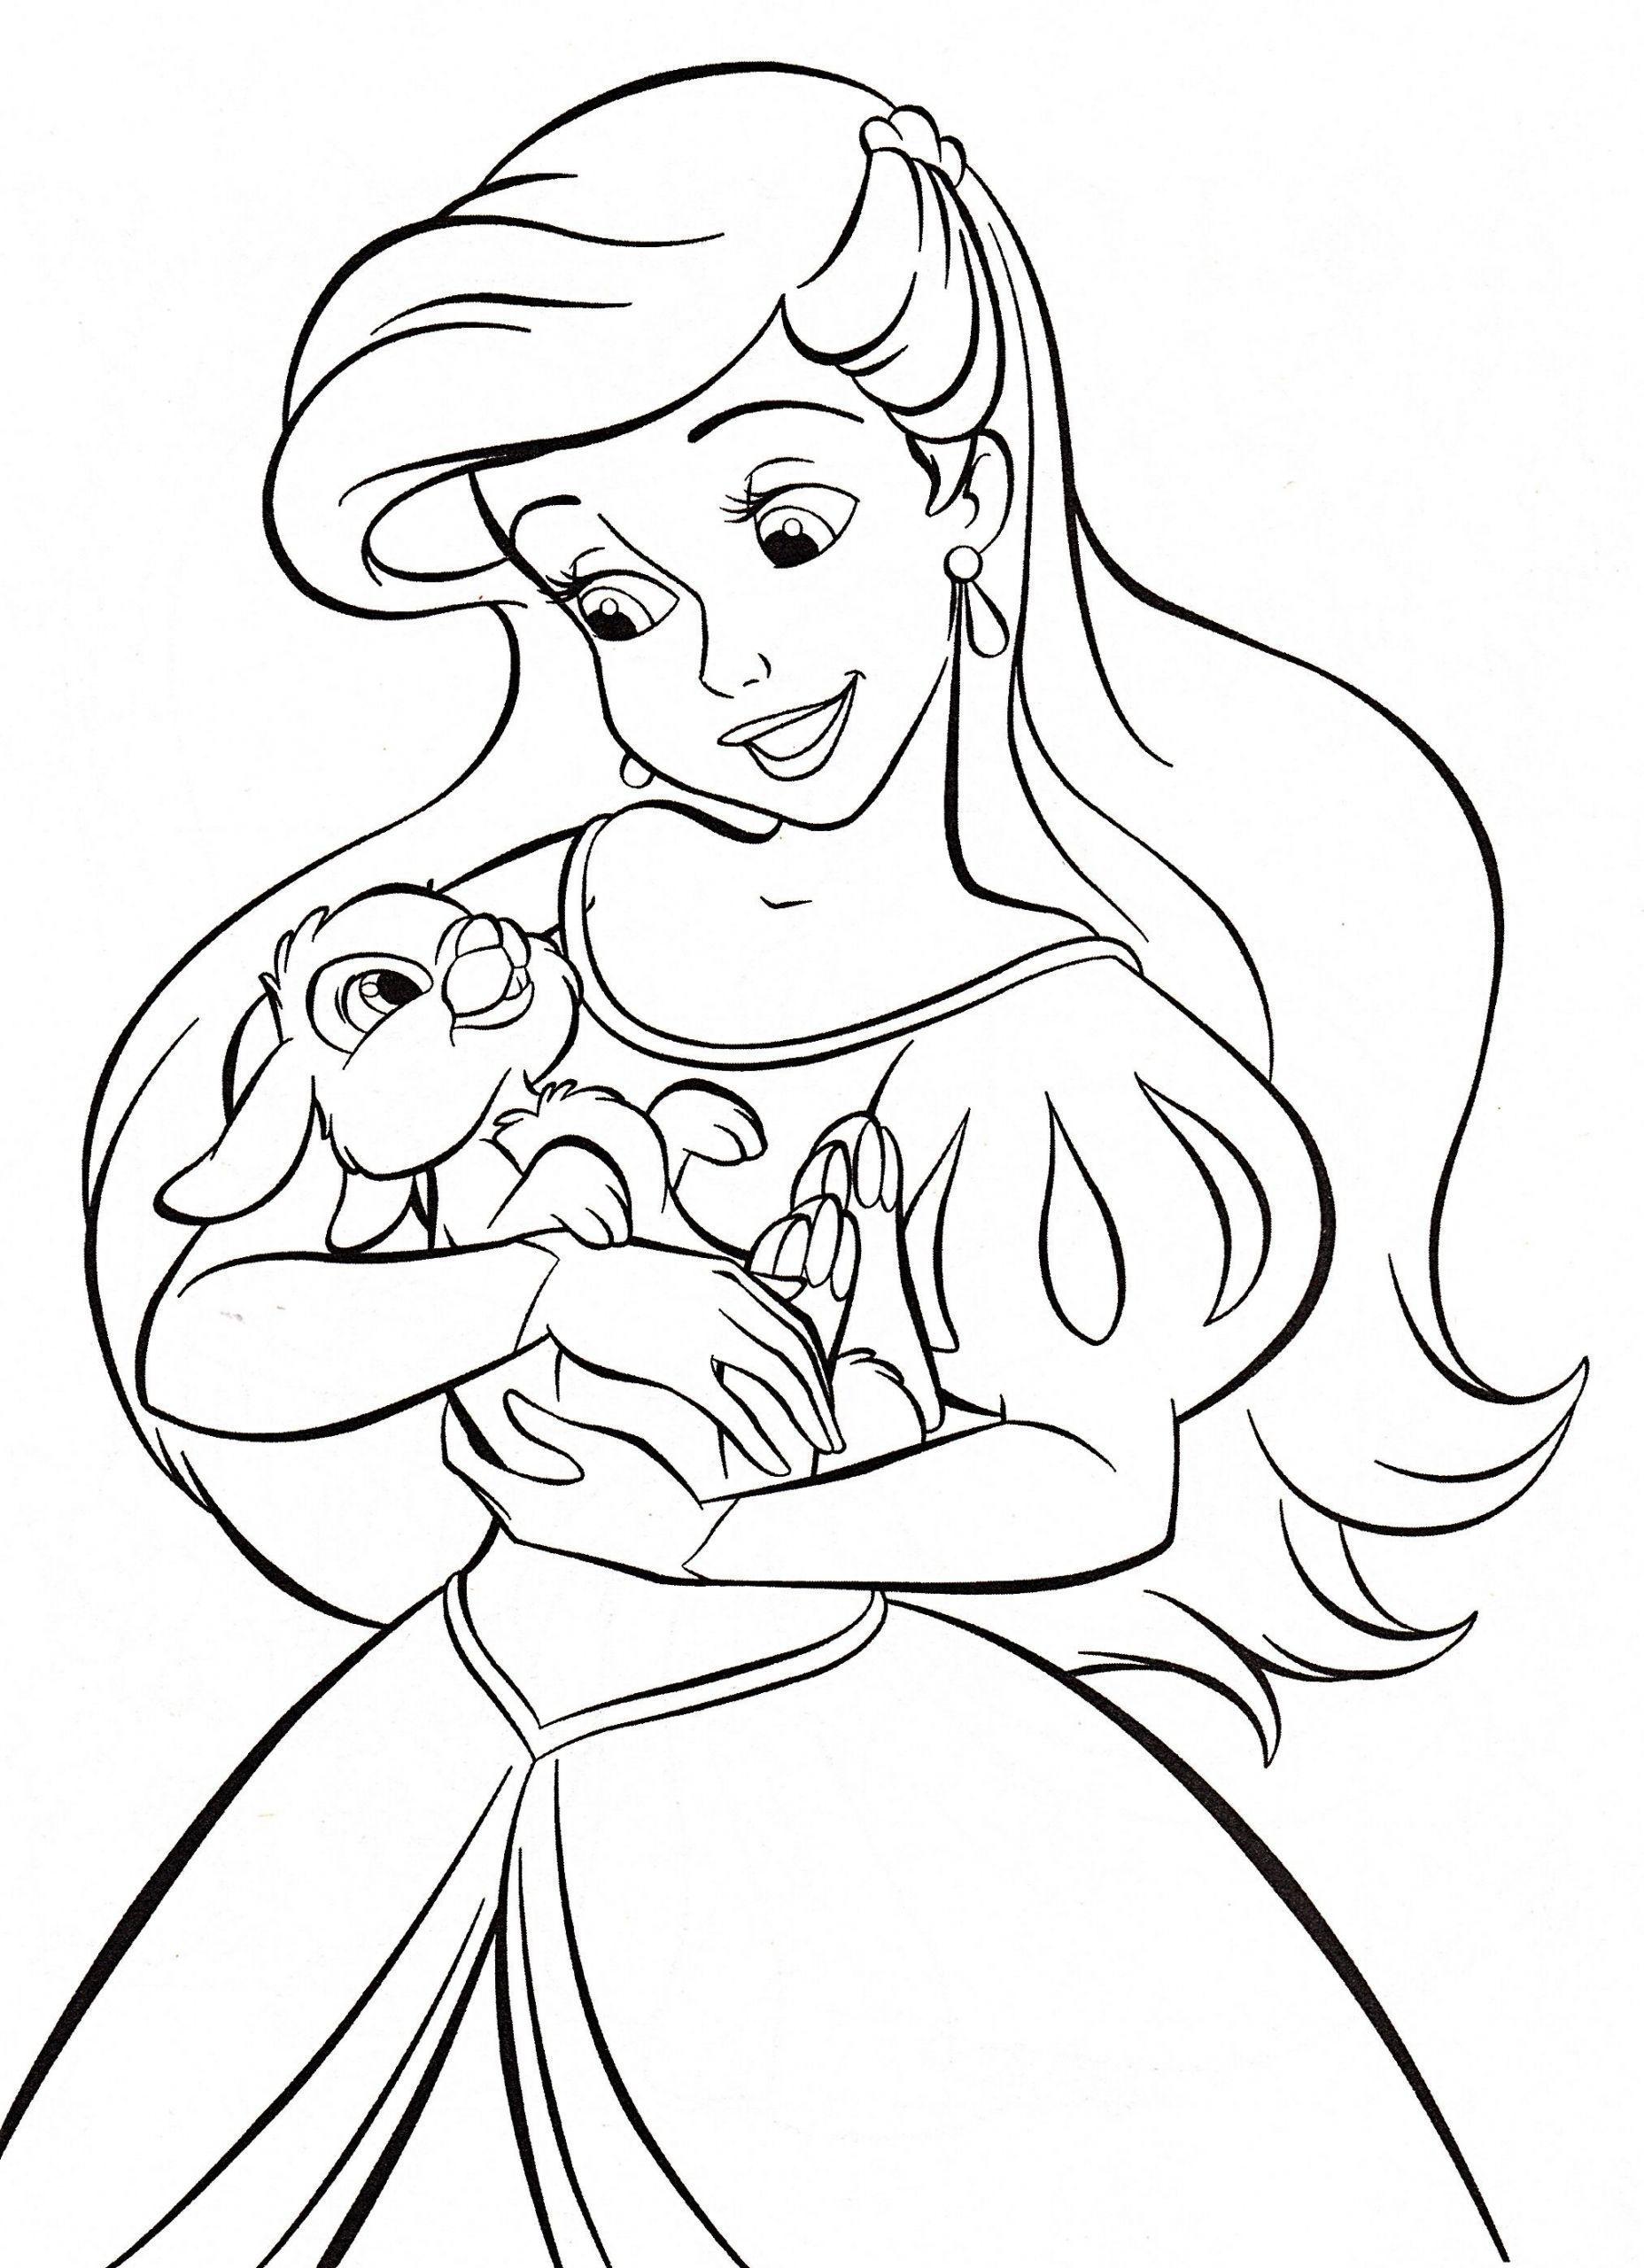 3 Disney Characters Online Coloring Walt Disney Coloring Pages Princess Ariel Walt Disney Coloriage Coloriage Poney Coloriage Princesse